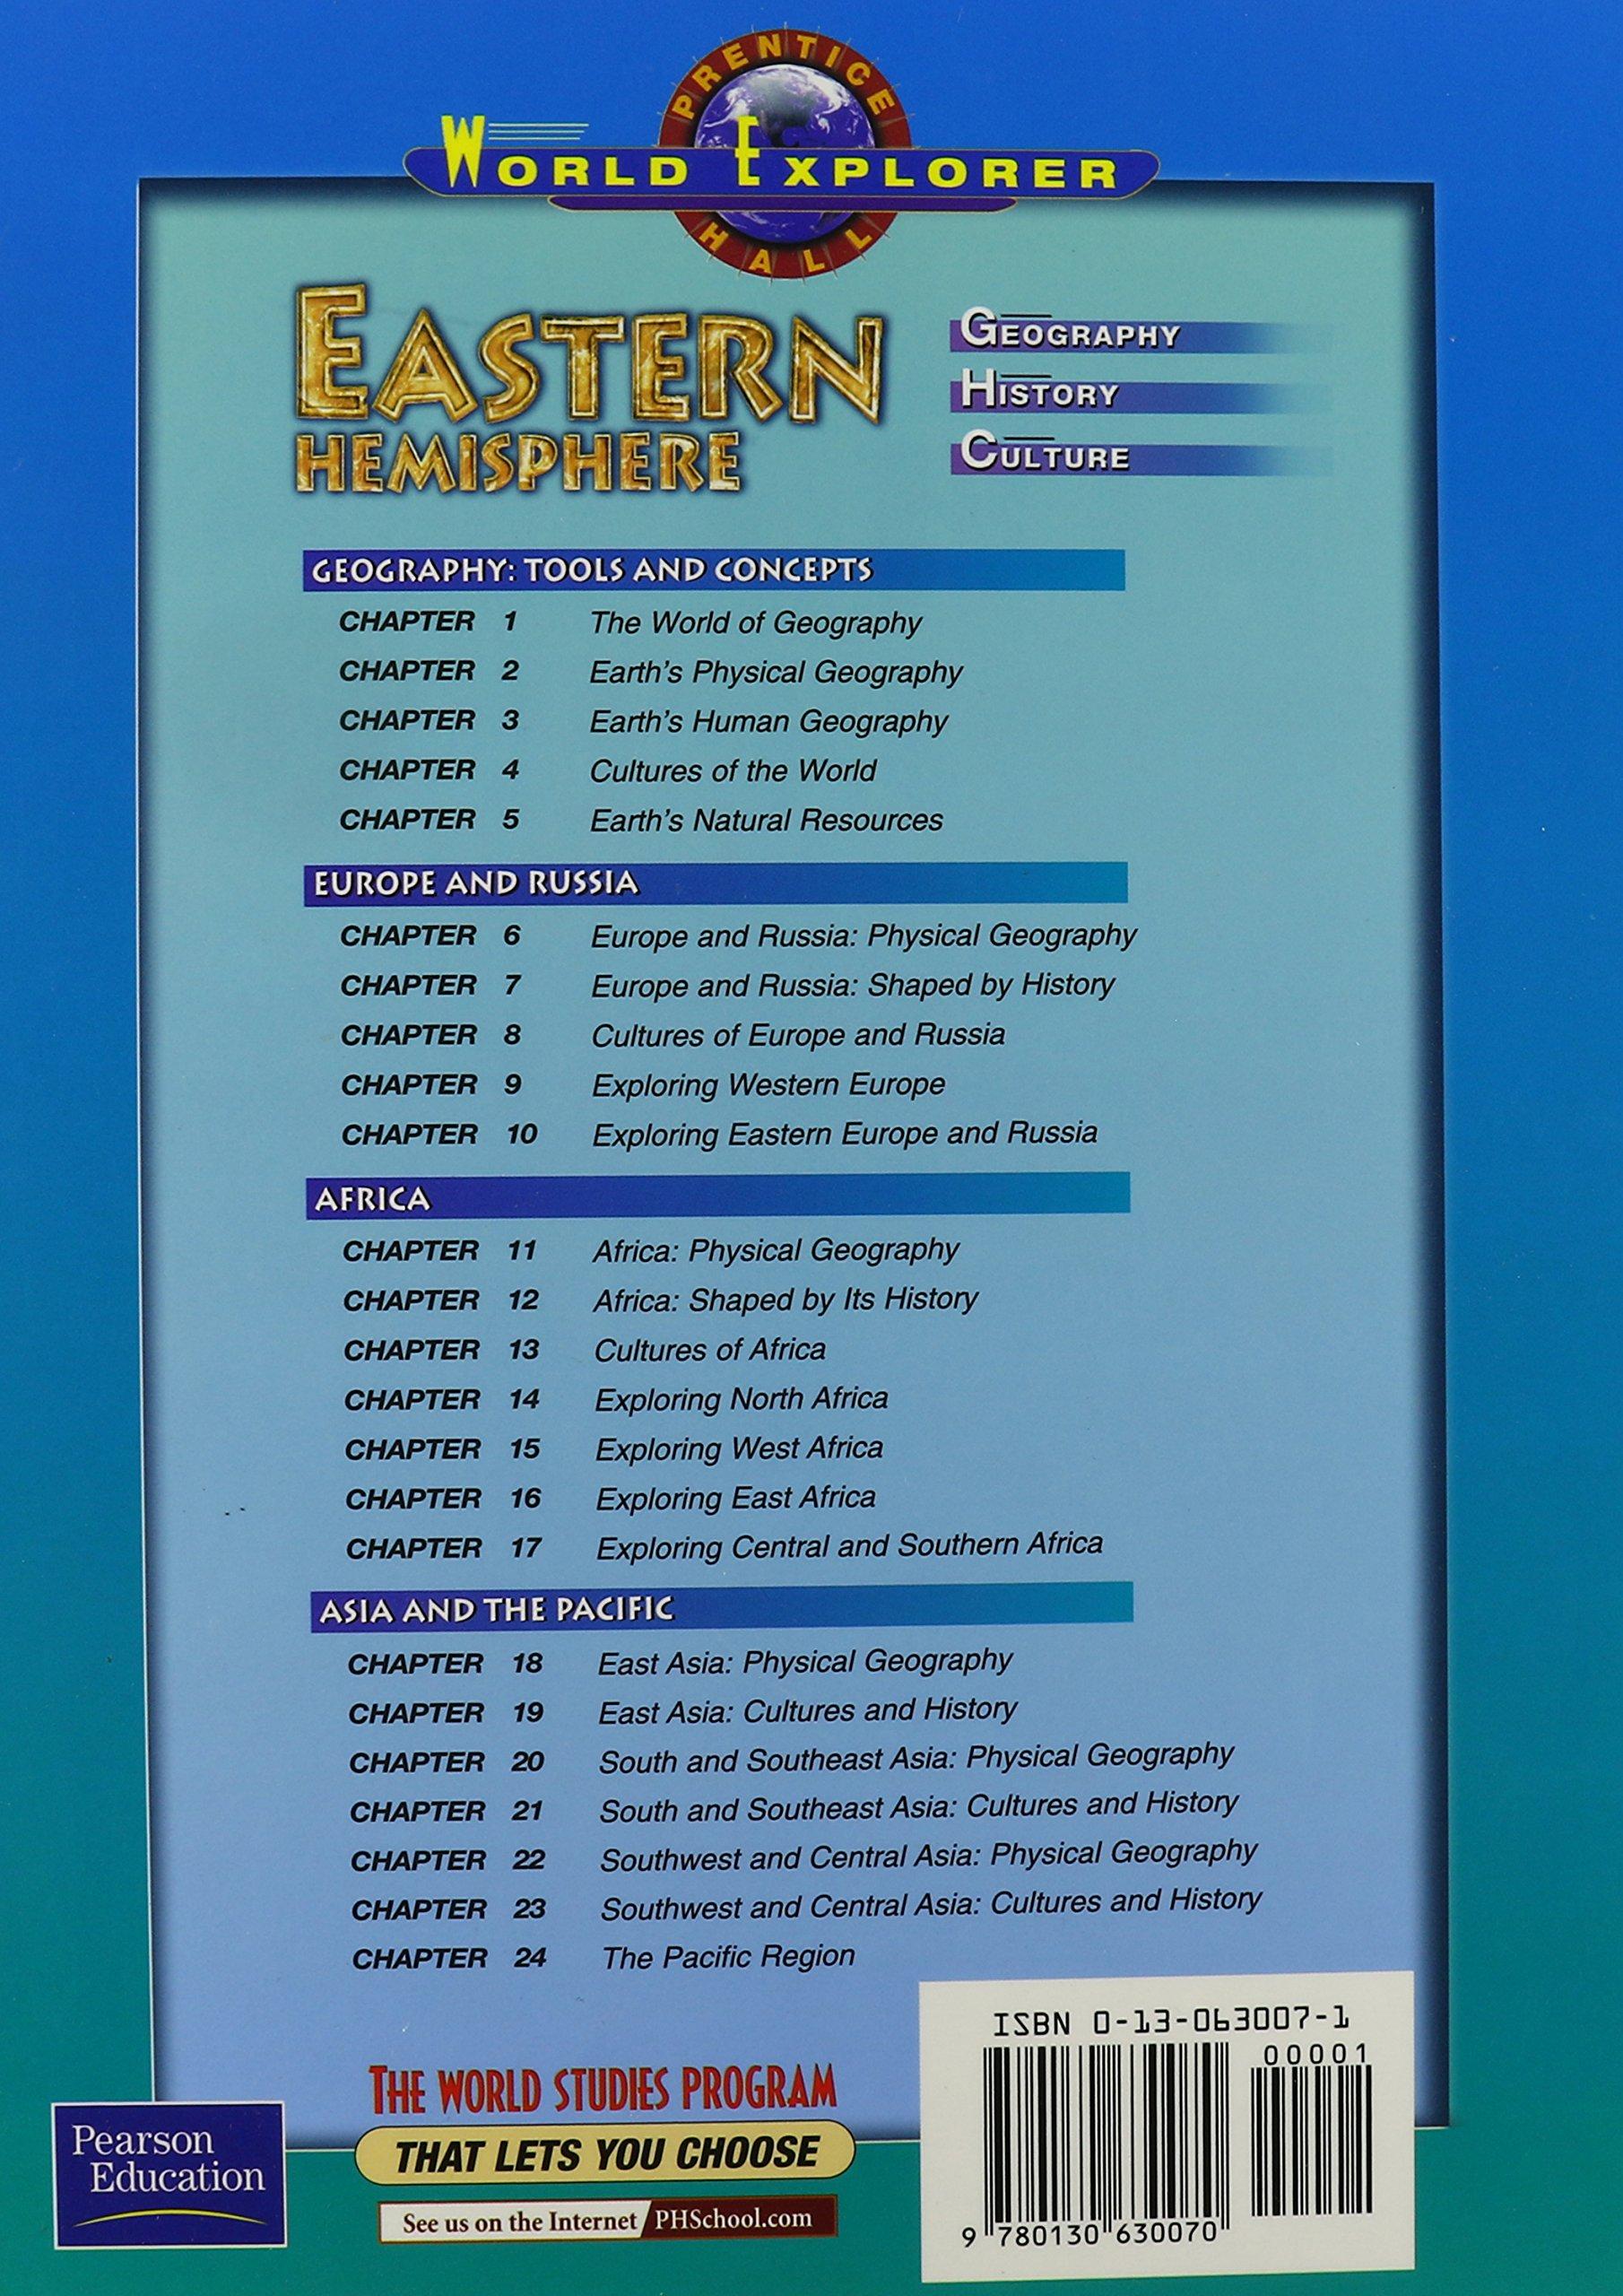 World explorer eastern hemisphere 3 edition student edition 2003c world explorer eastern hemisphere 3 edition student edition 2003c prentice hall world explorer prentice hall 9780130630070 amazon books sciox Images